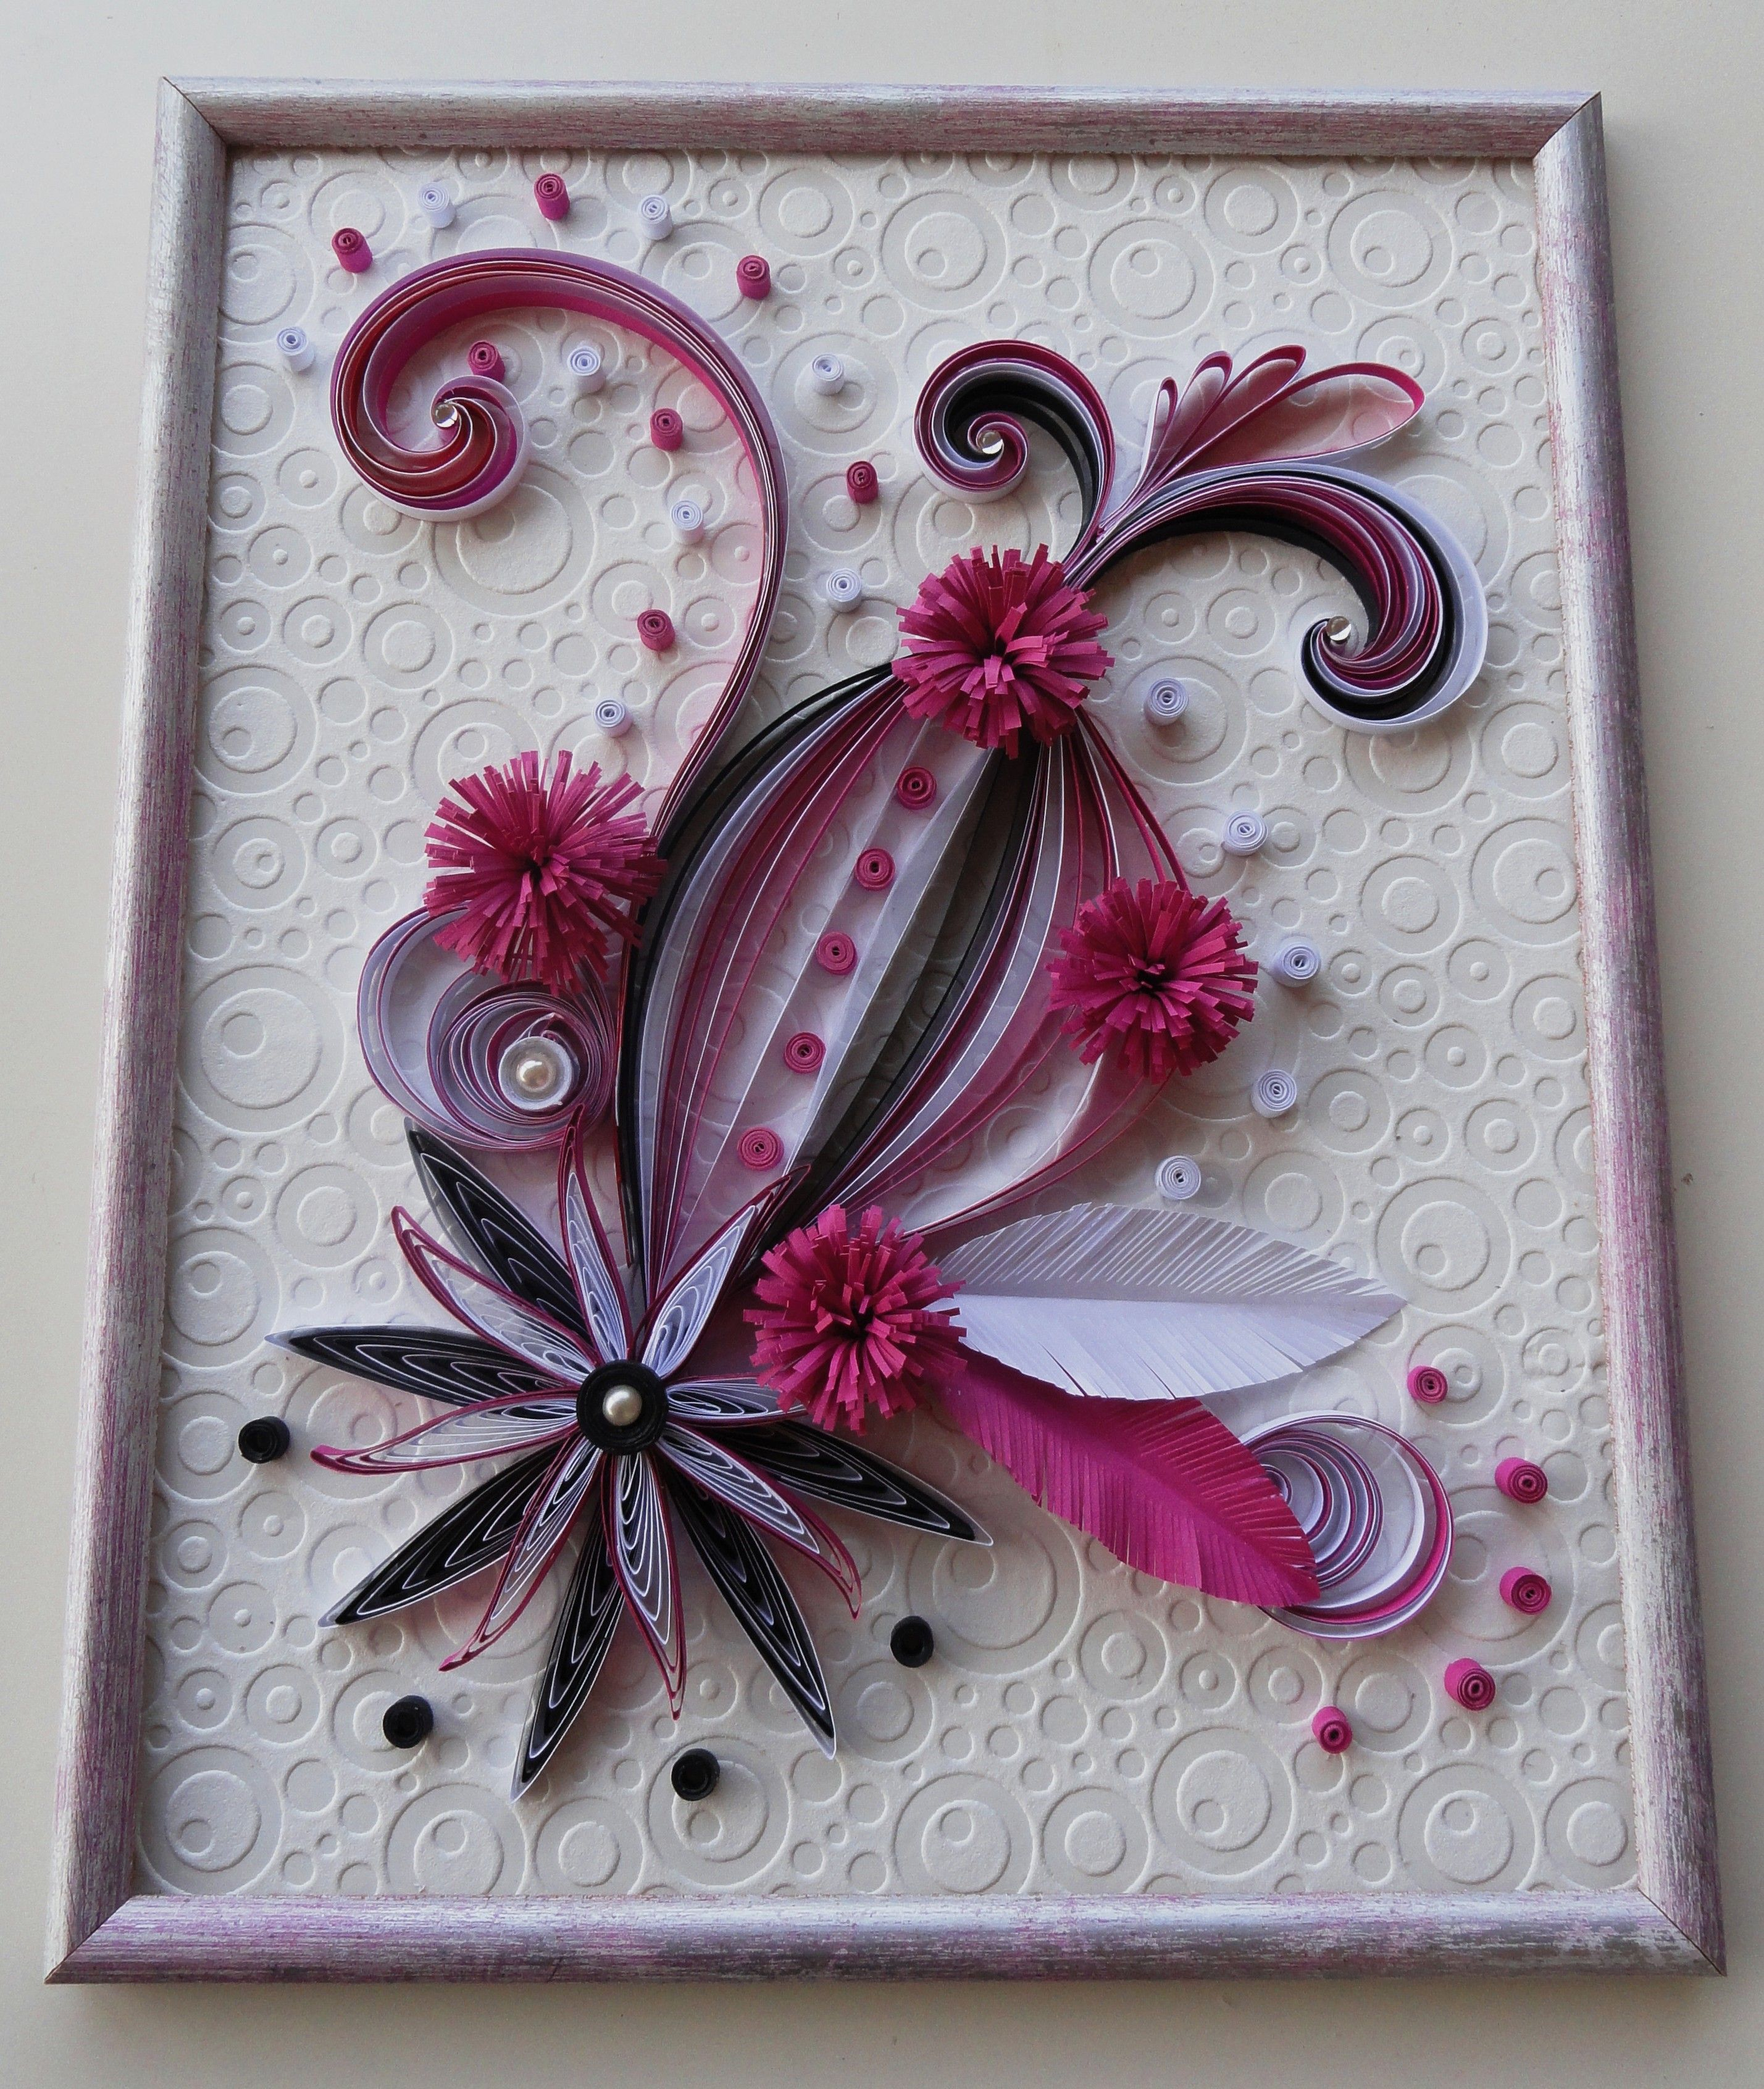 Rose noir et blanc inspirer du blog de Neli   Quilling floral ... for Quilling Butterfly Tutorial  585hul